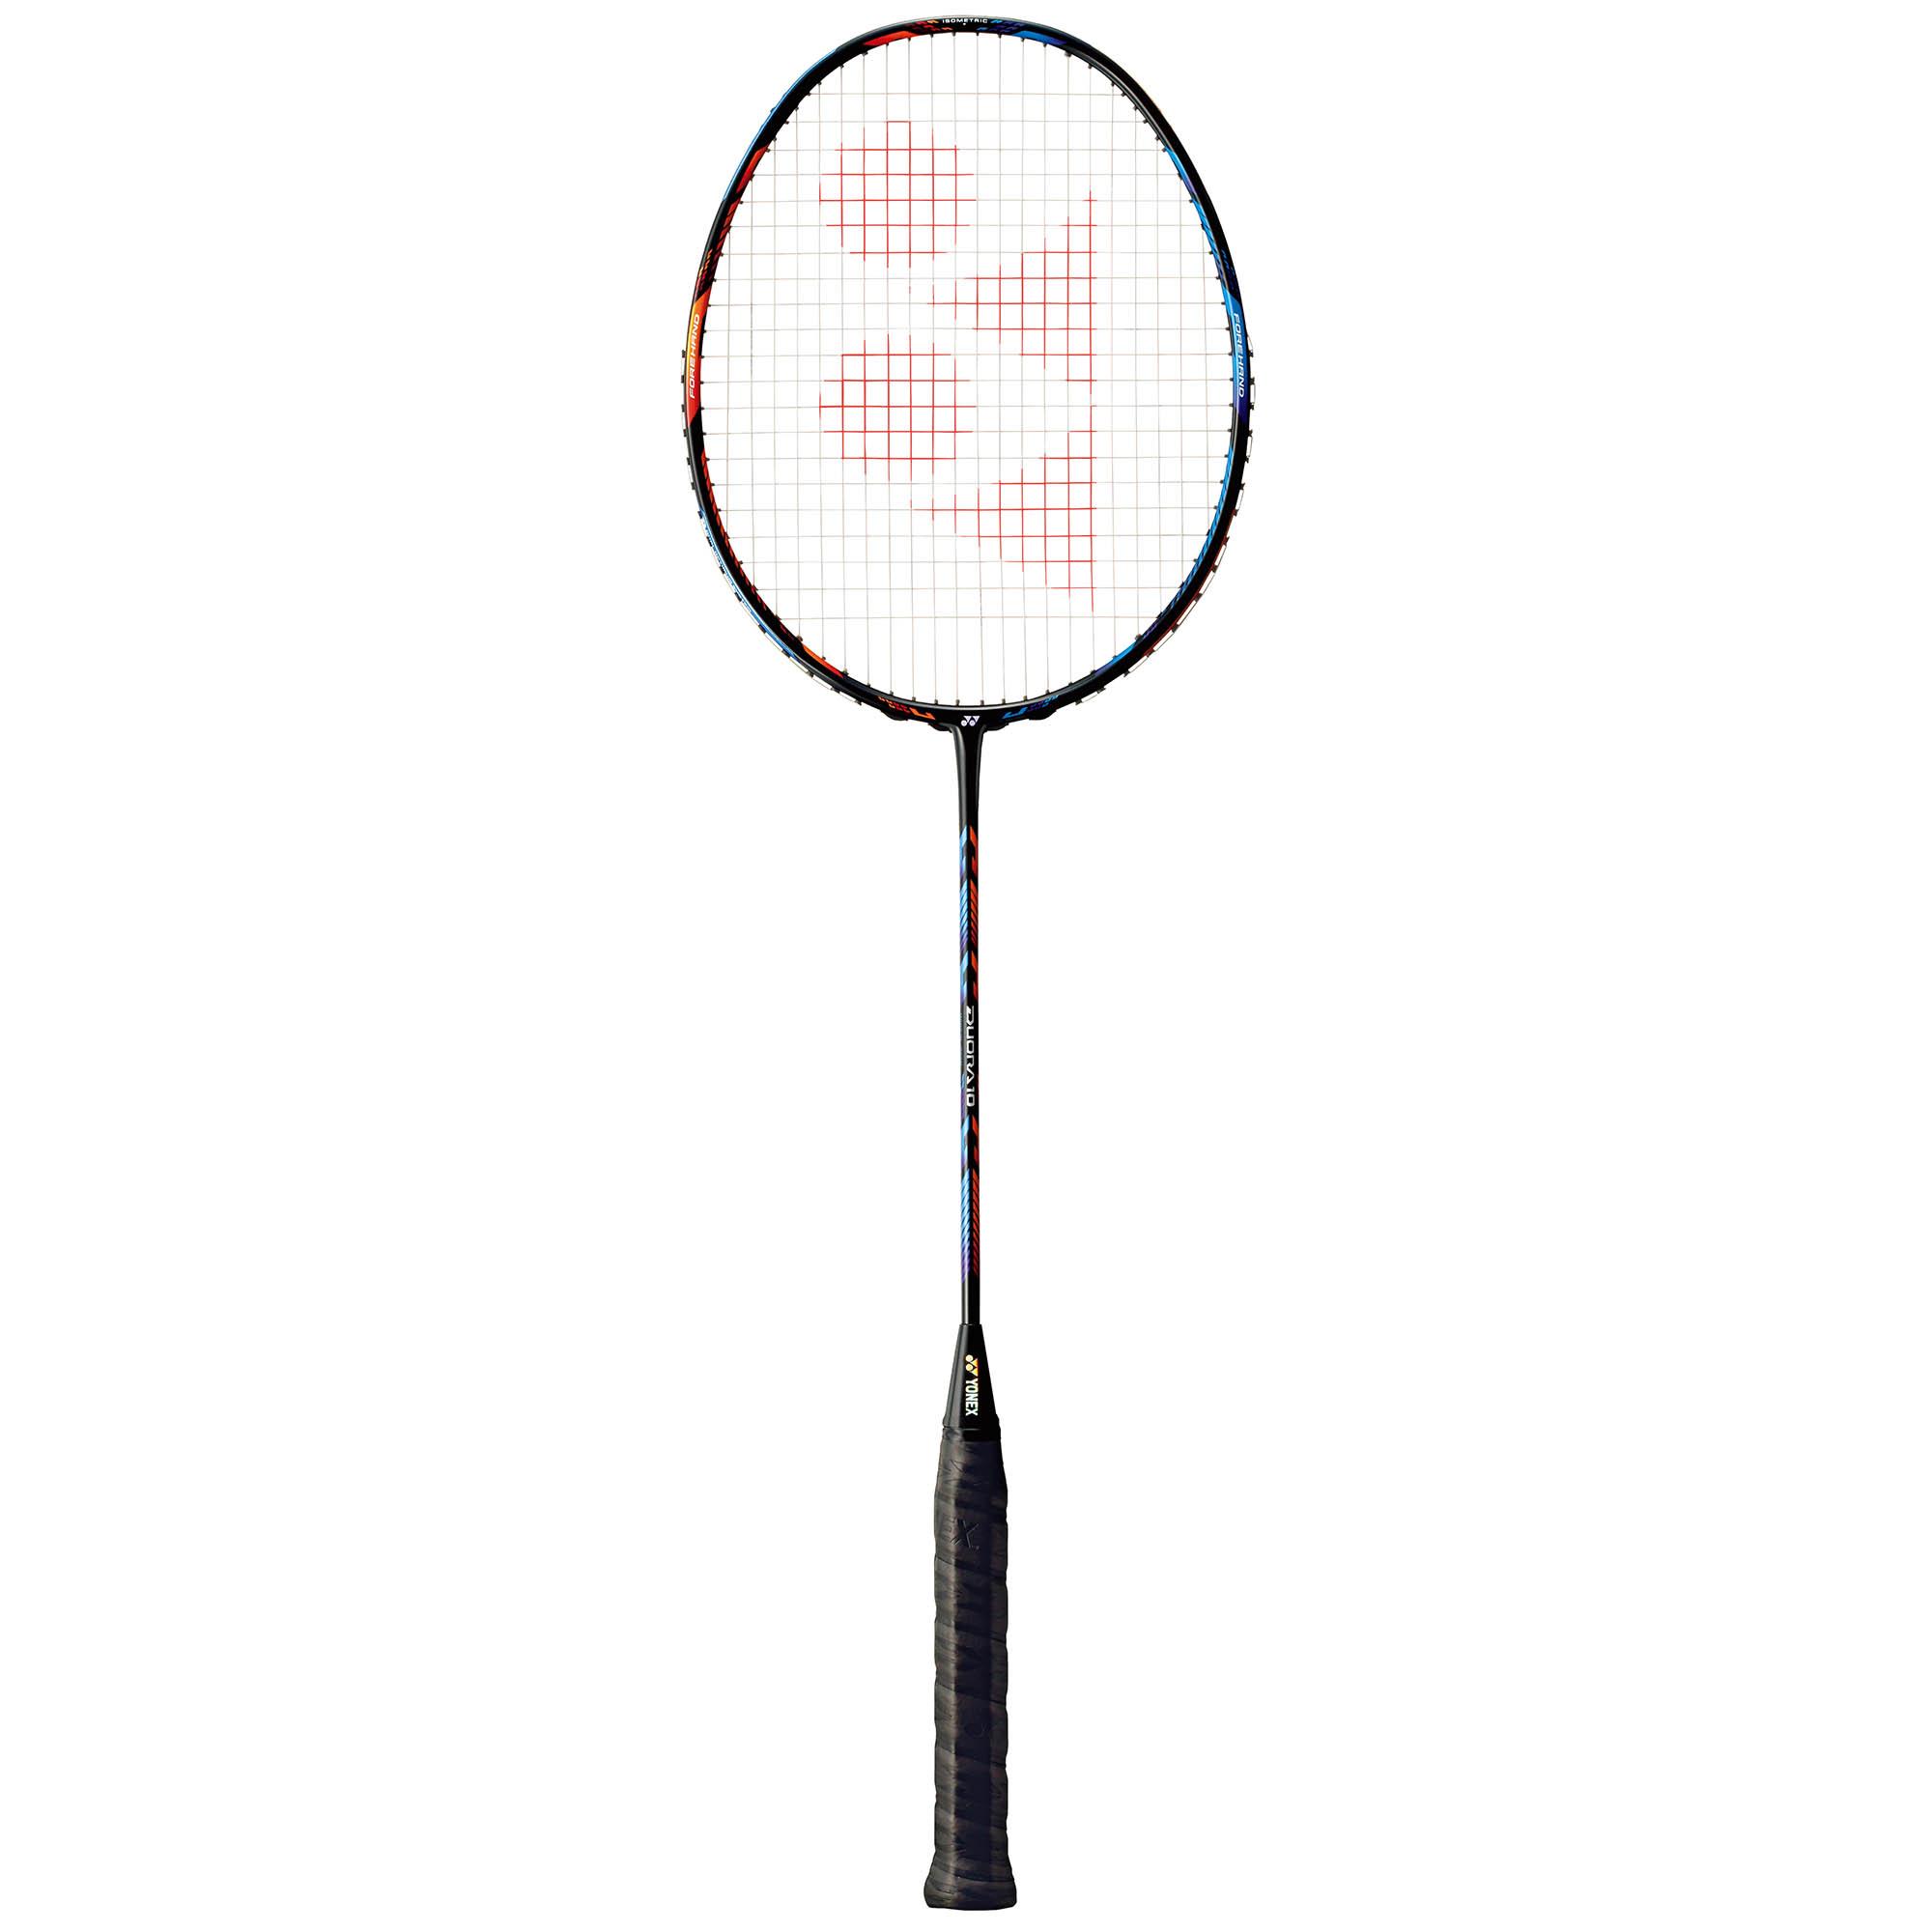 Yonex Duora 10 Badminton Racket - Blue/Orange